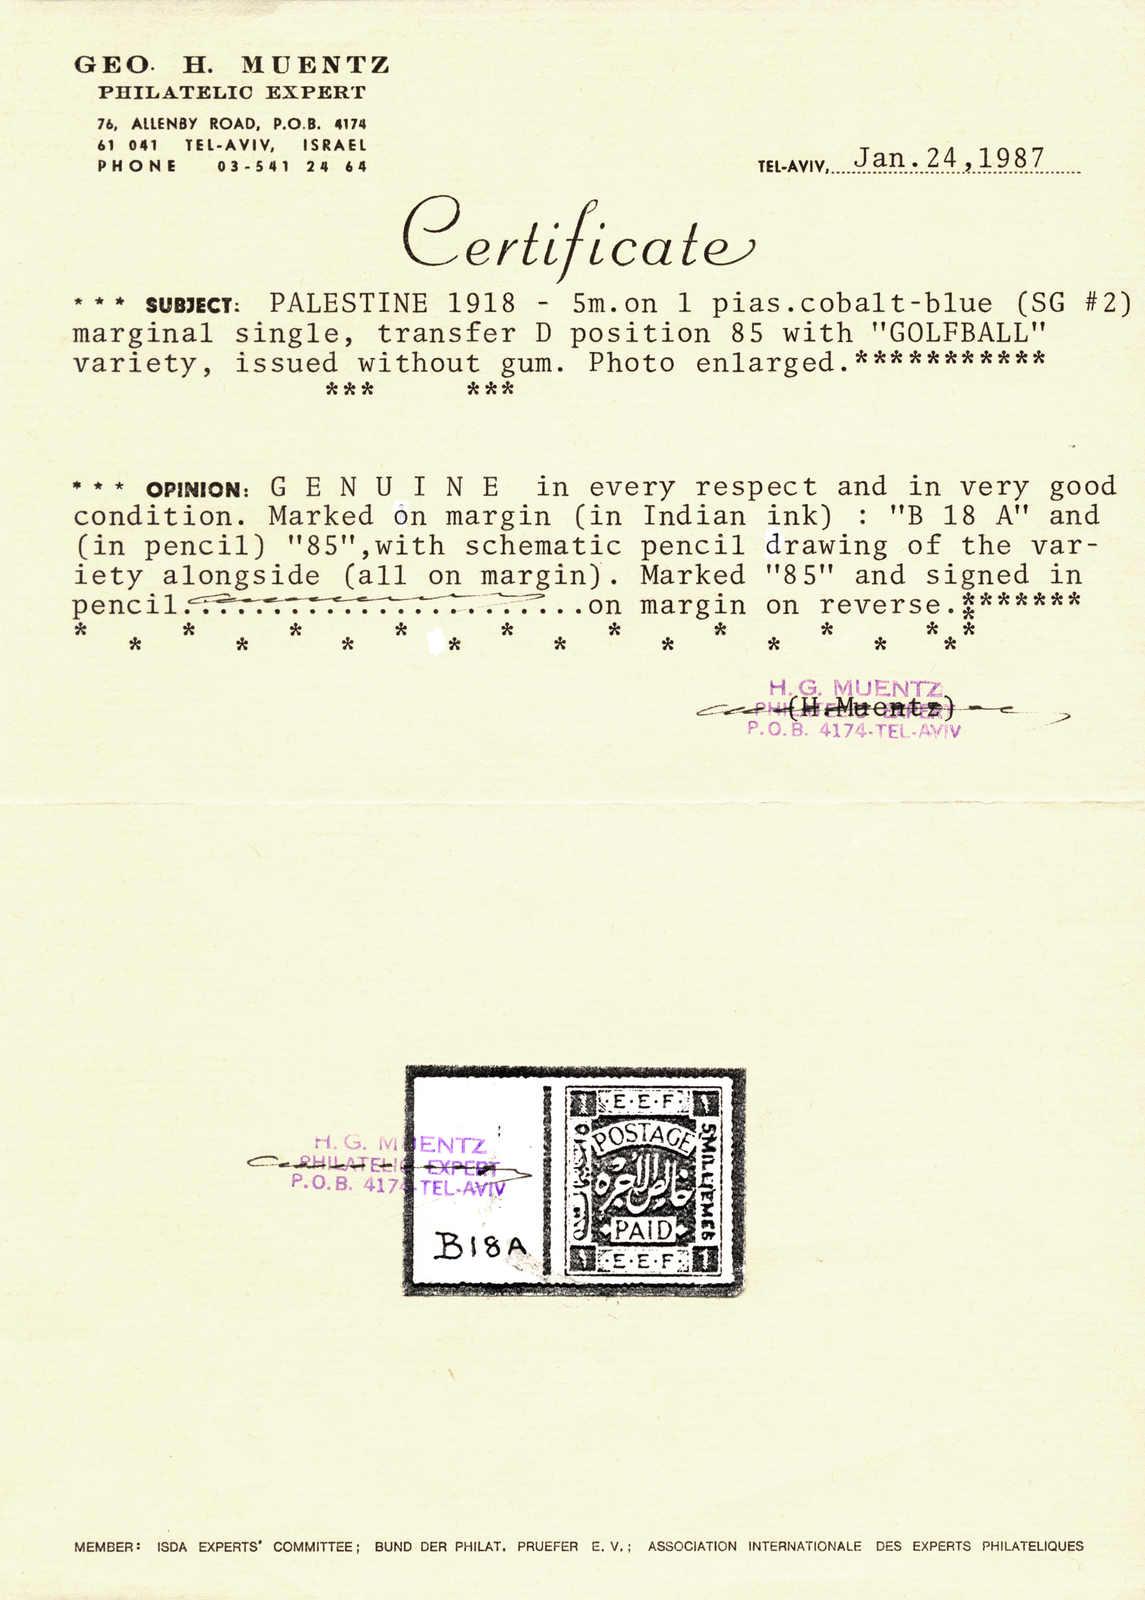 Lot 30269 - andere gebiete palästina -  classicphil GmbH 6'th classicphil Auction - Day 3